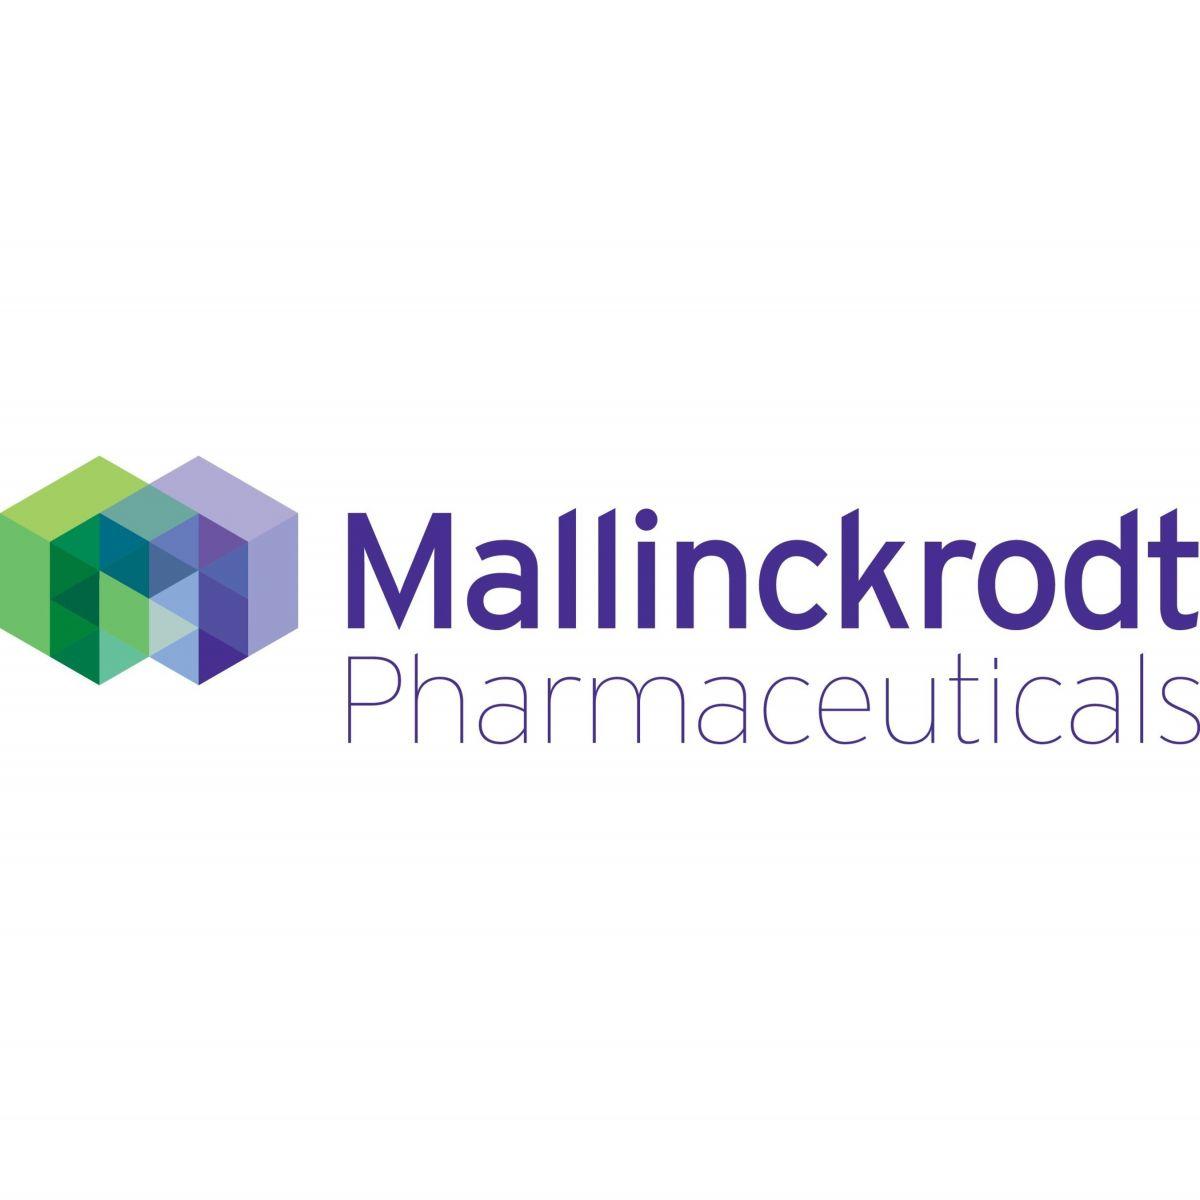 Mallinckrodt, Pain Medicine, Opioids, epidemic, Addiction